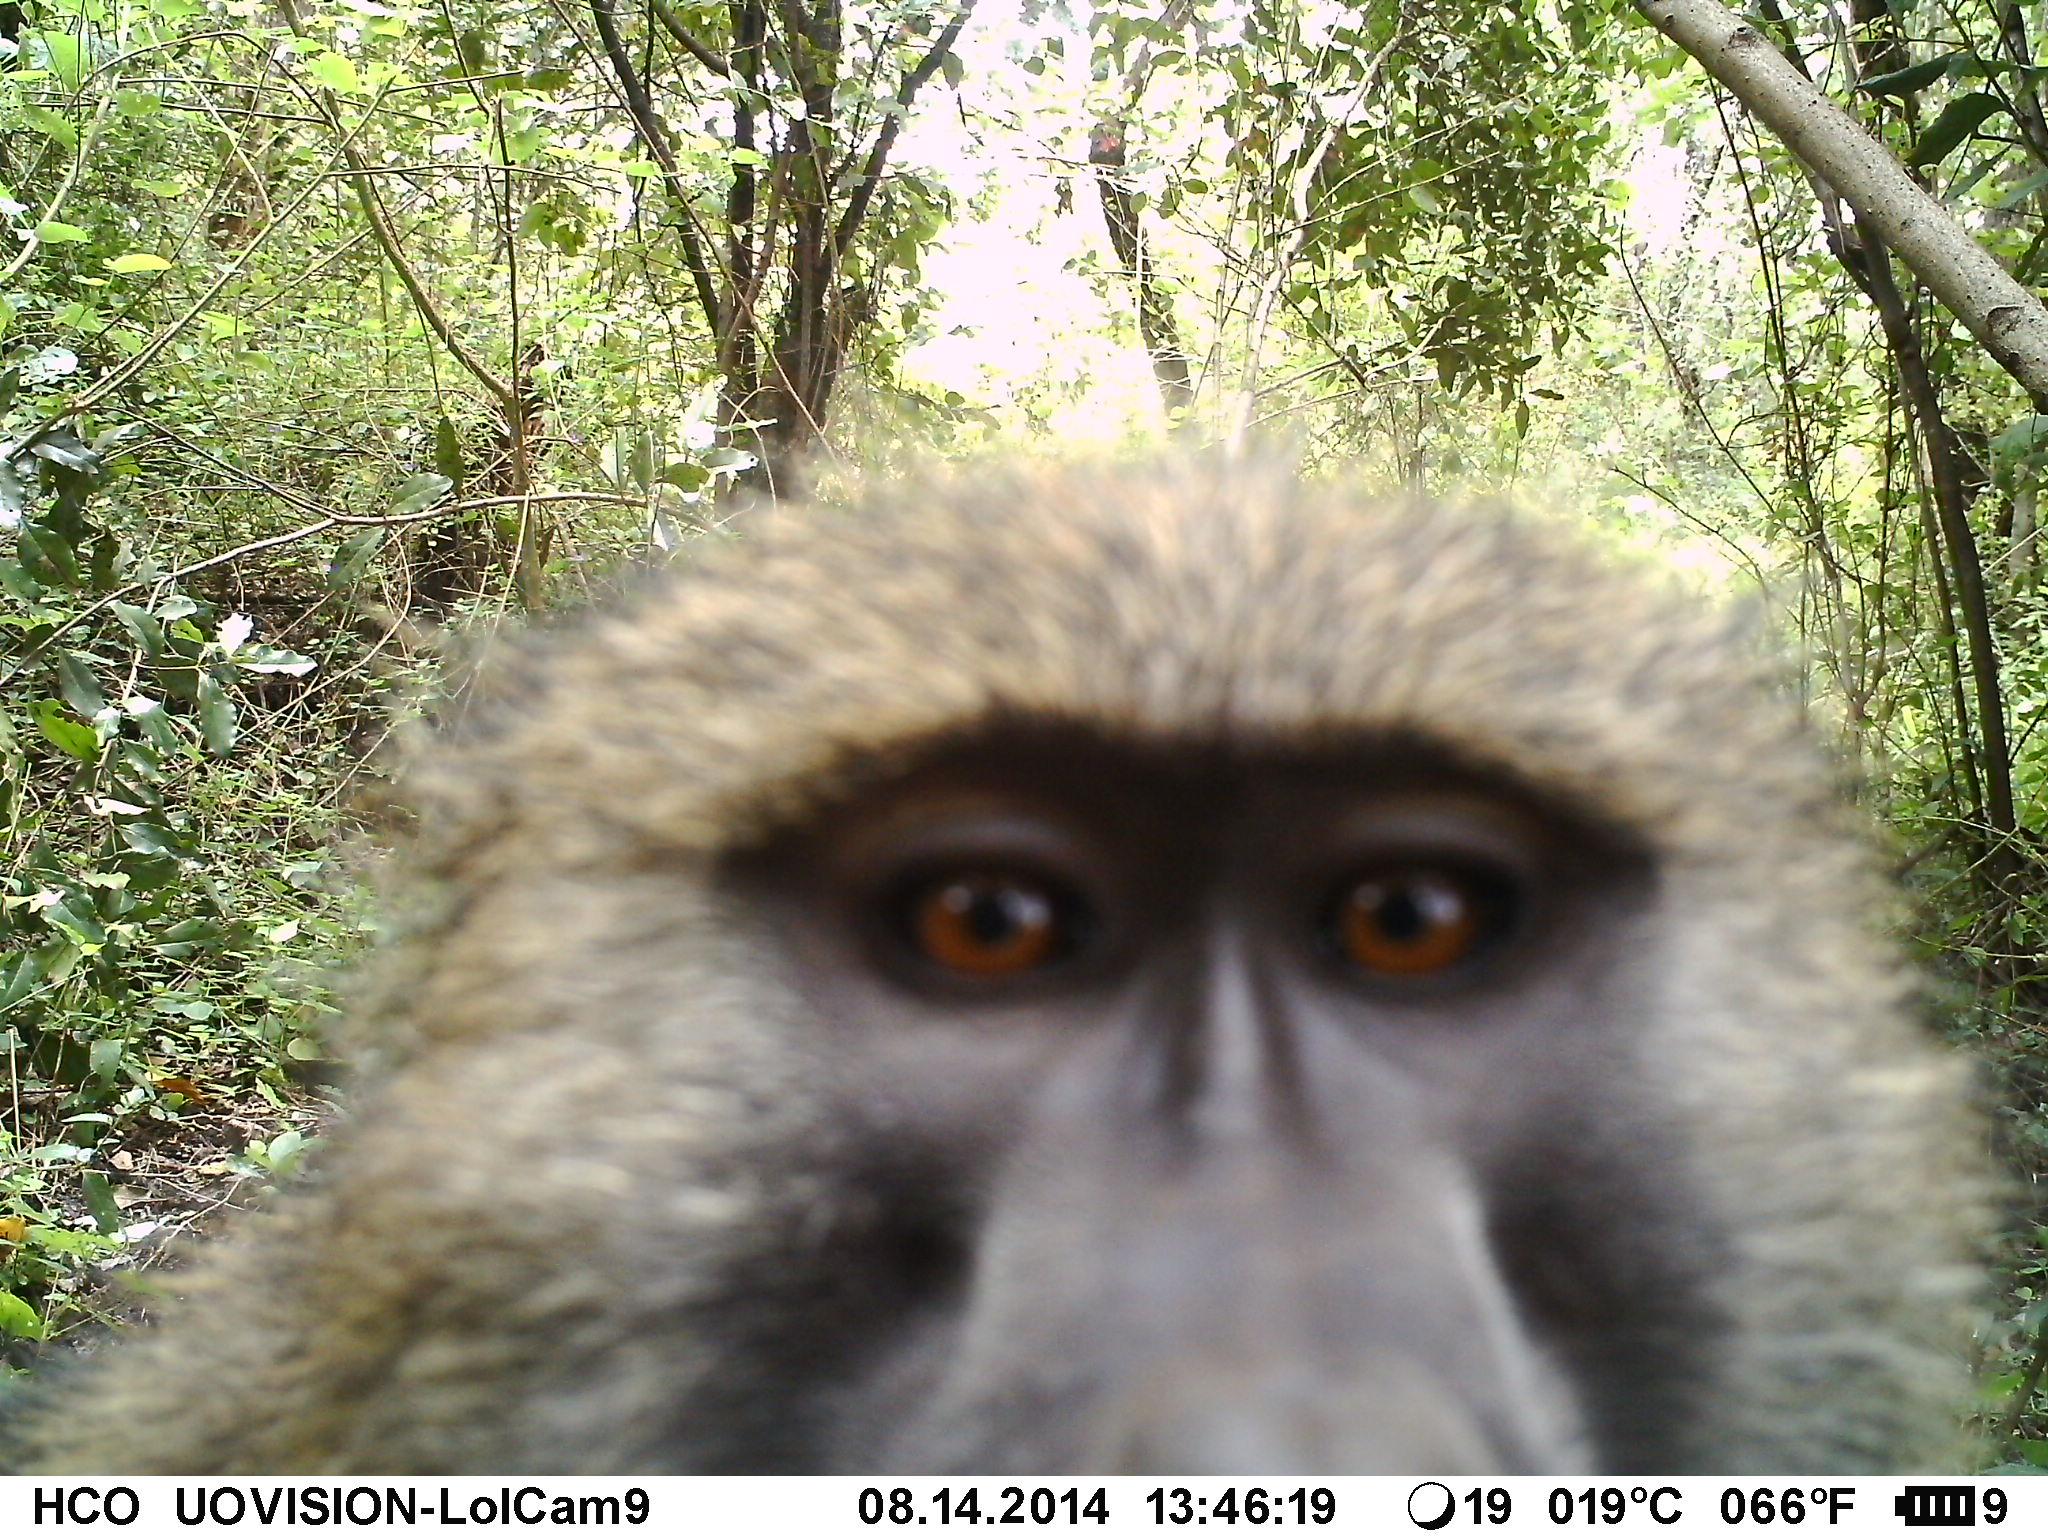 IMAG0128 - Olive baboon